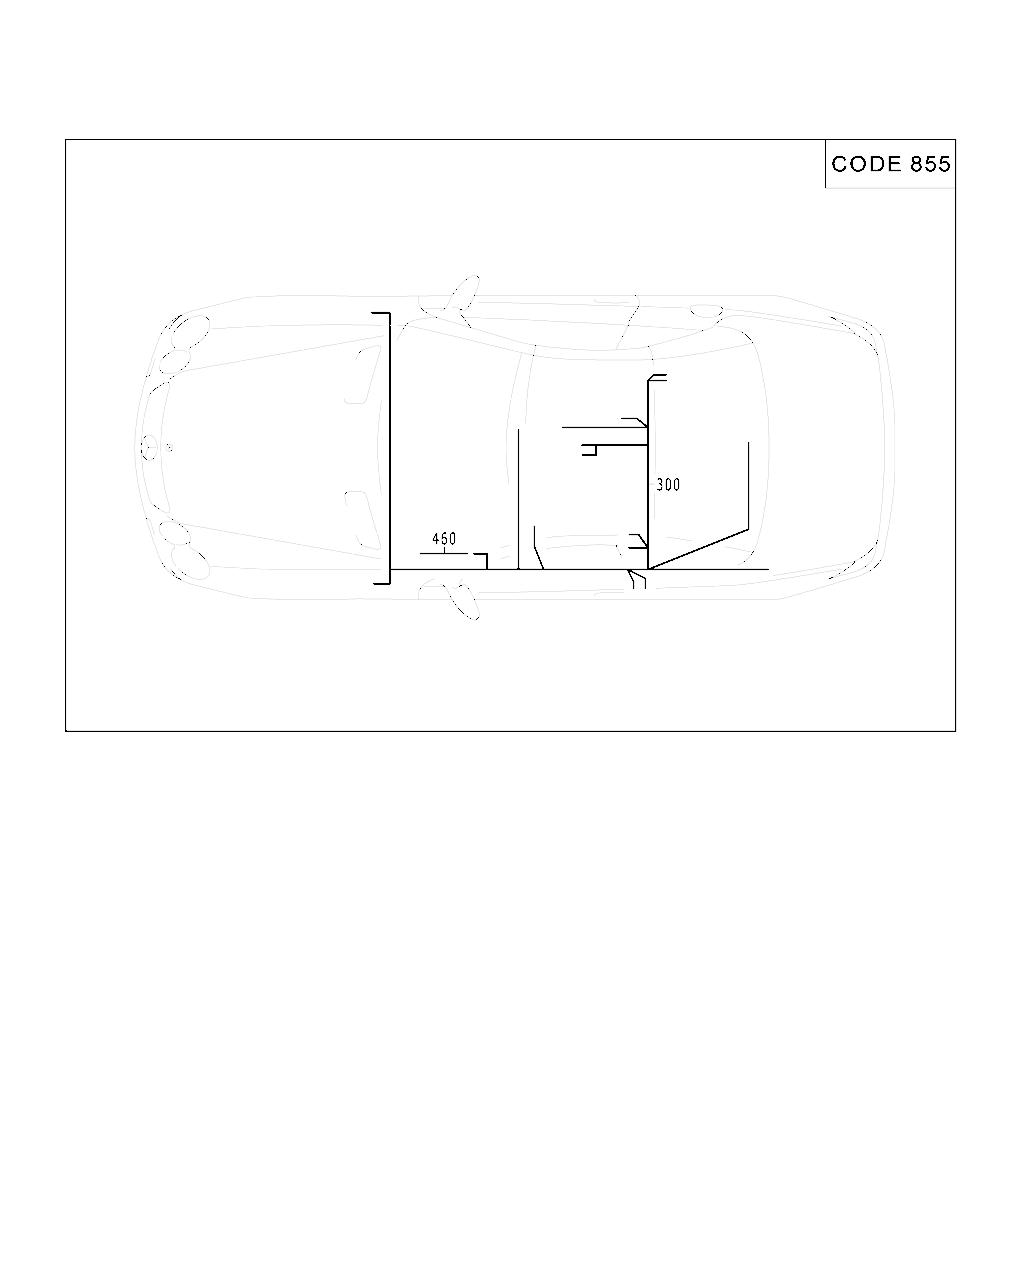 Mercedes Benz Teilekatalog Ersatzteile Online Uhi Wiring Image